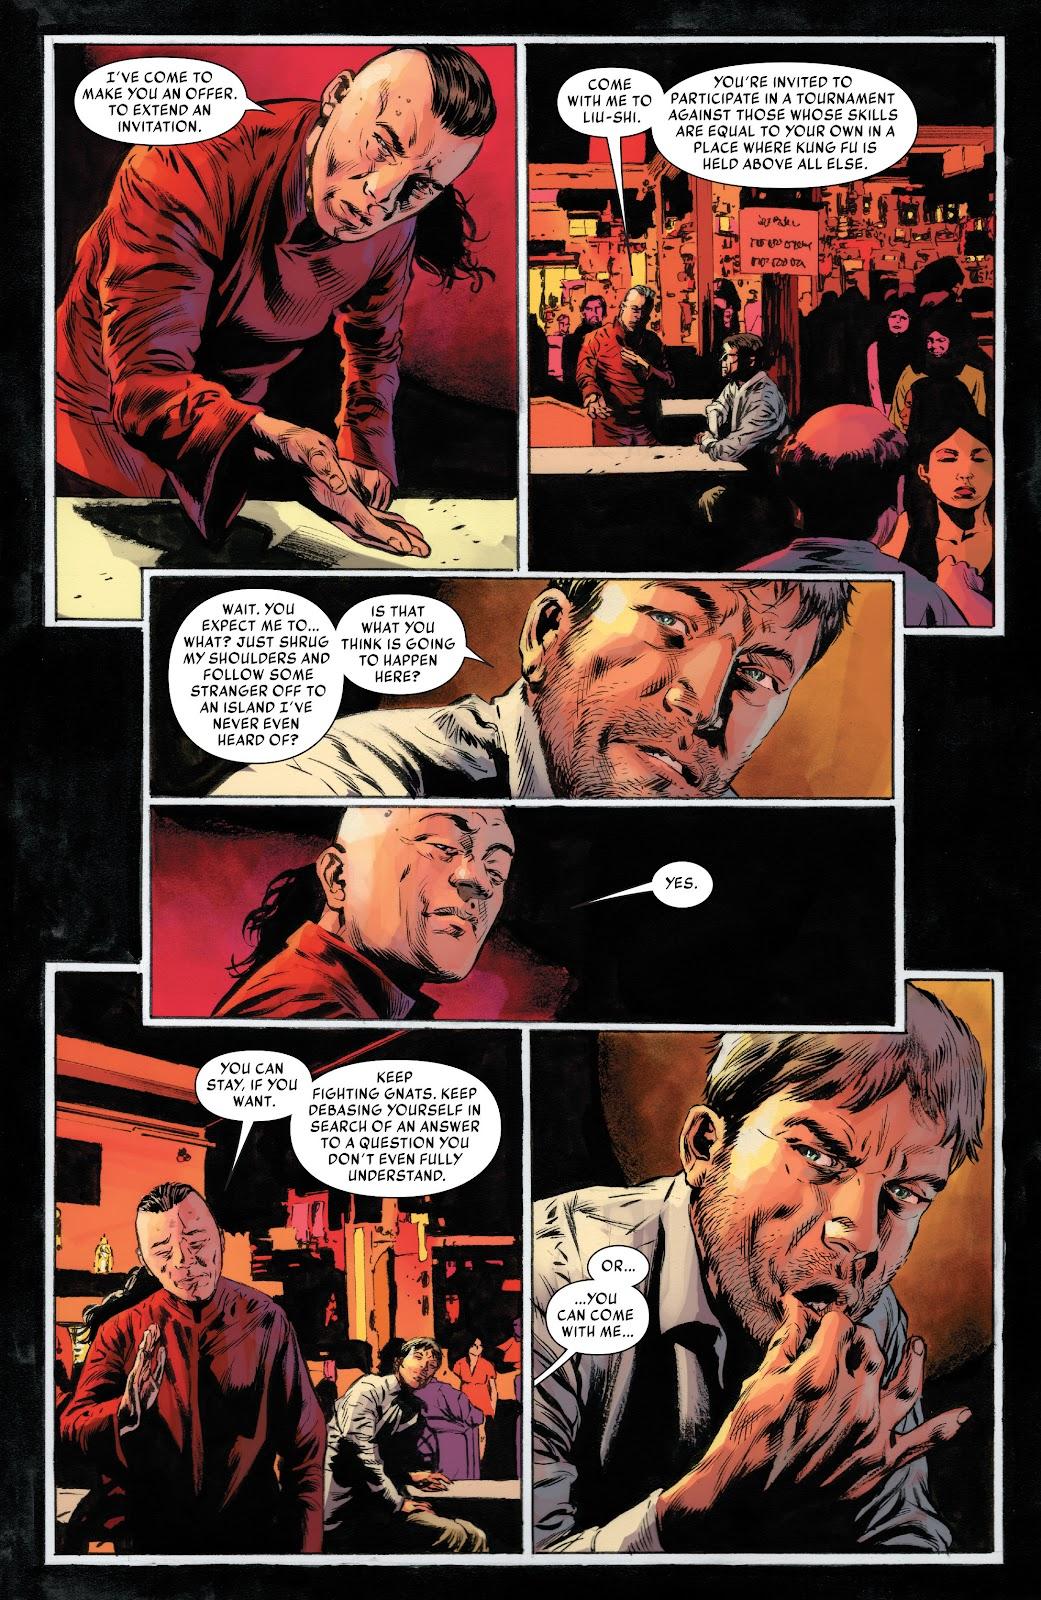 Iron Fist (2017) Issue #1 #1 - English 21